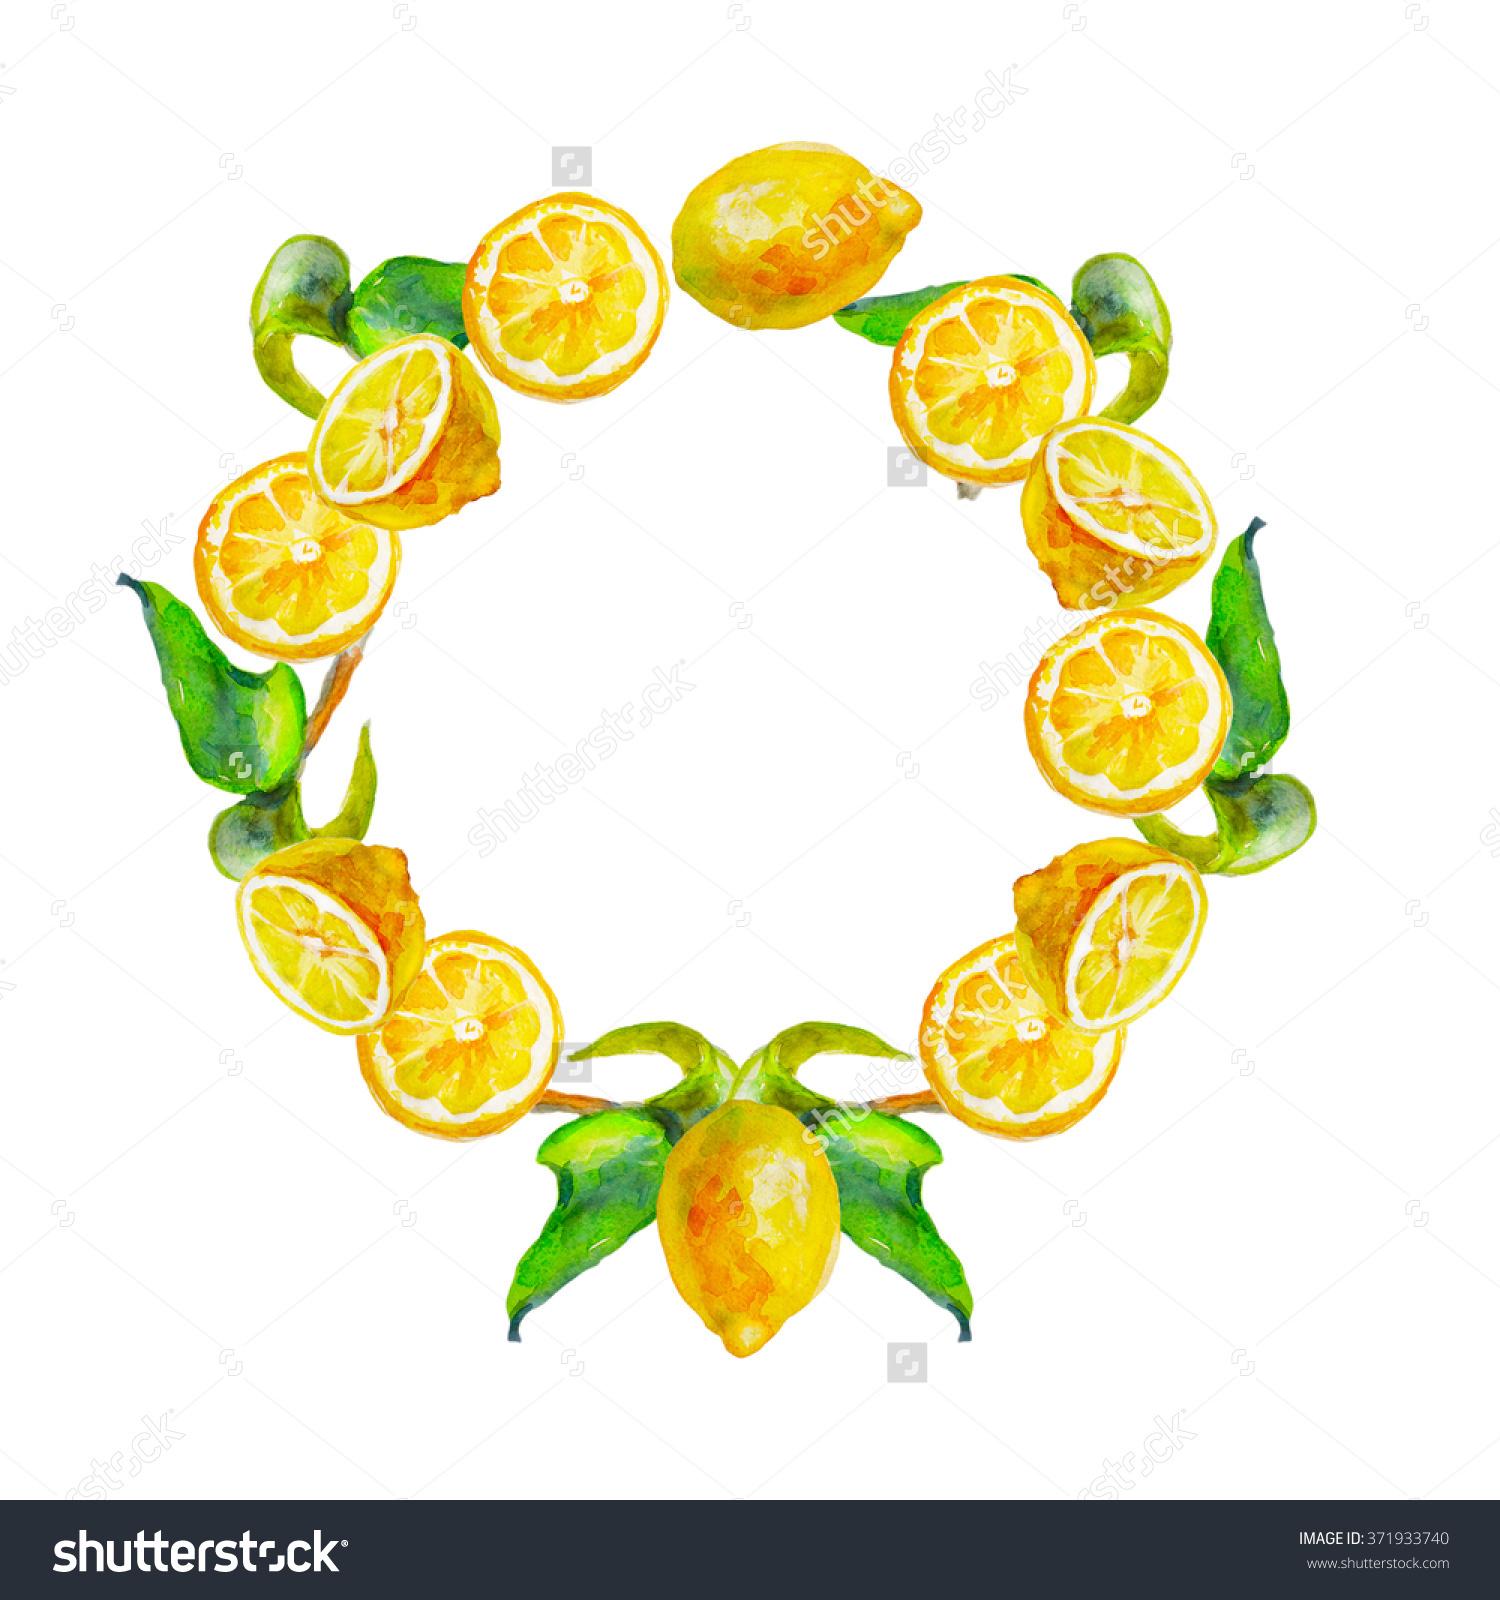 Watercolor lemon wreath free clipart png vector freeuse library Frame Ripe Lemons Watercolor Lemon Wreath Stock Illustration ... vector freeuse library